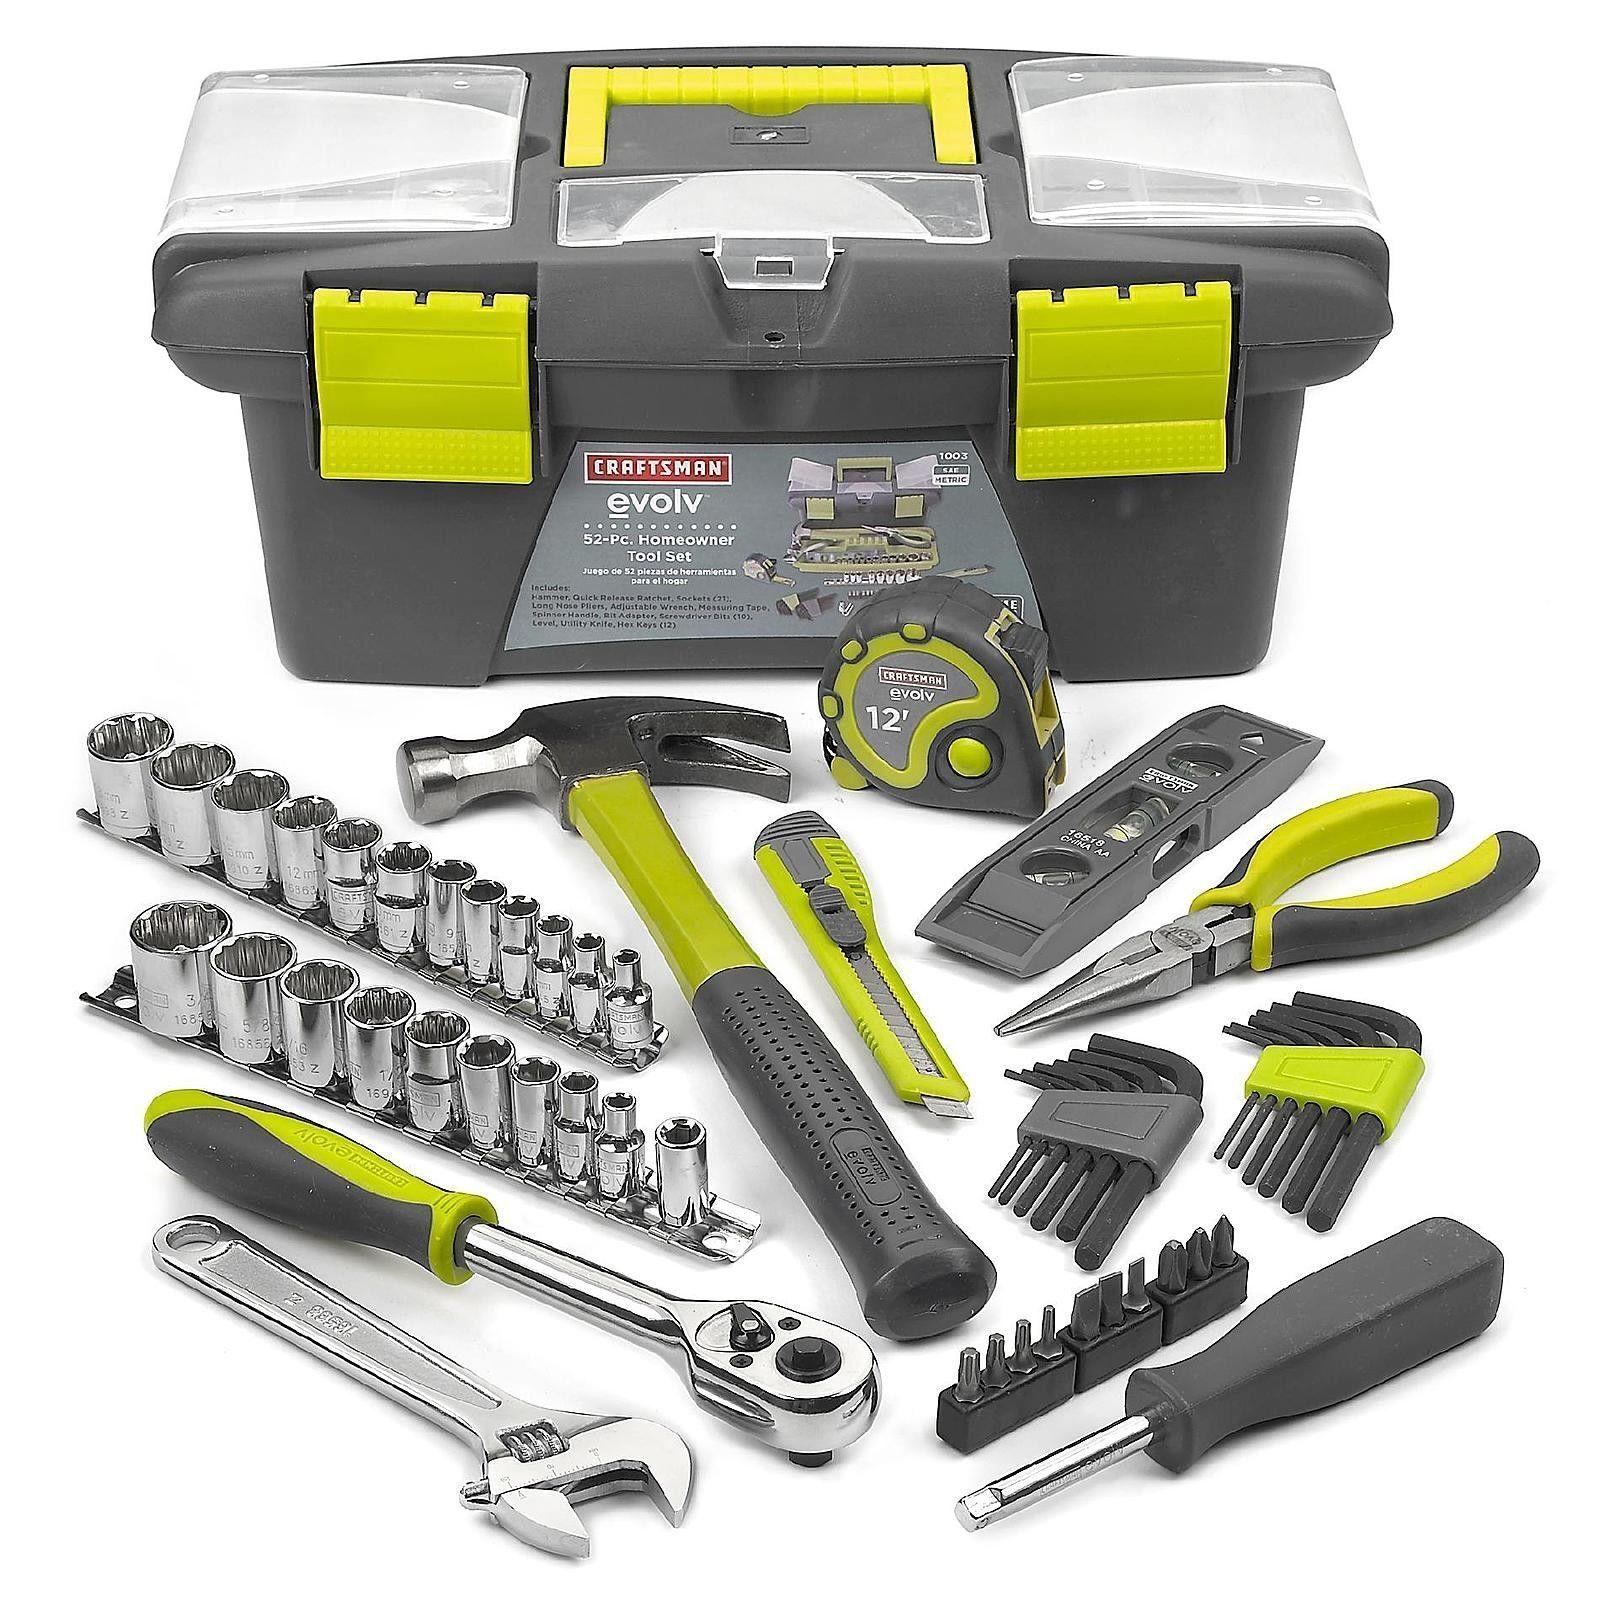 Craftsman evolv 52 piece homeowner tool kit